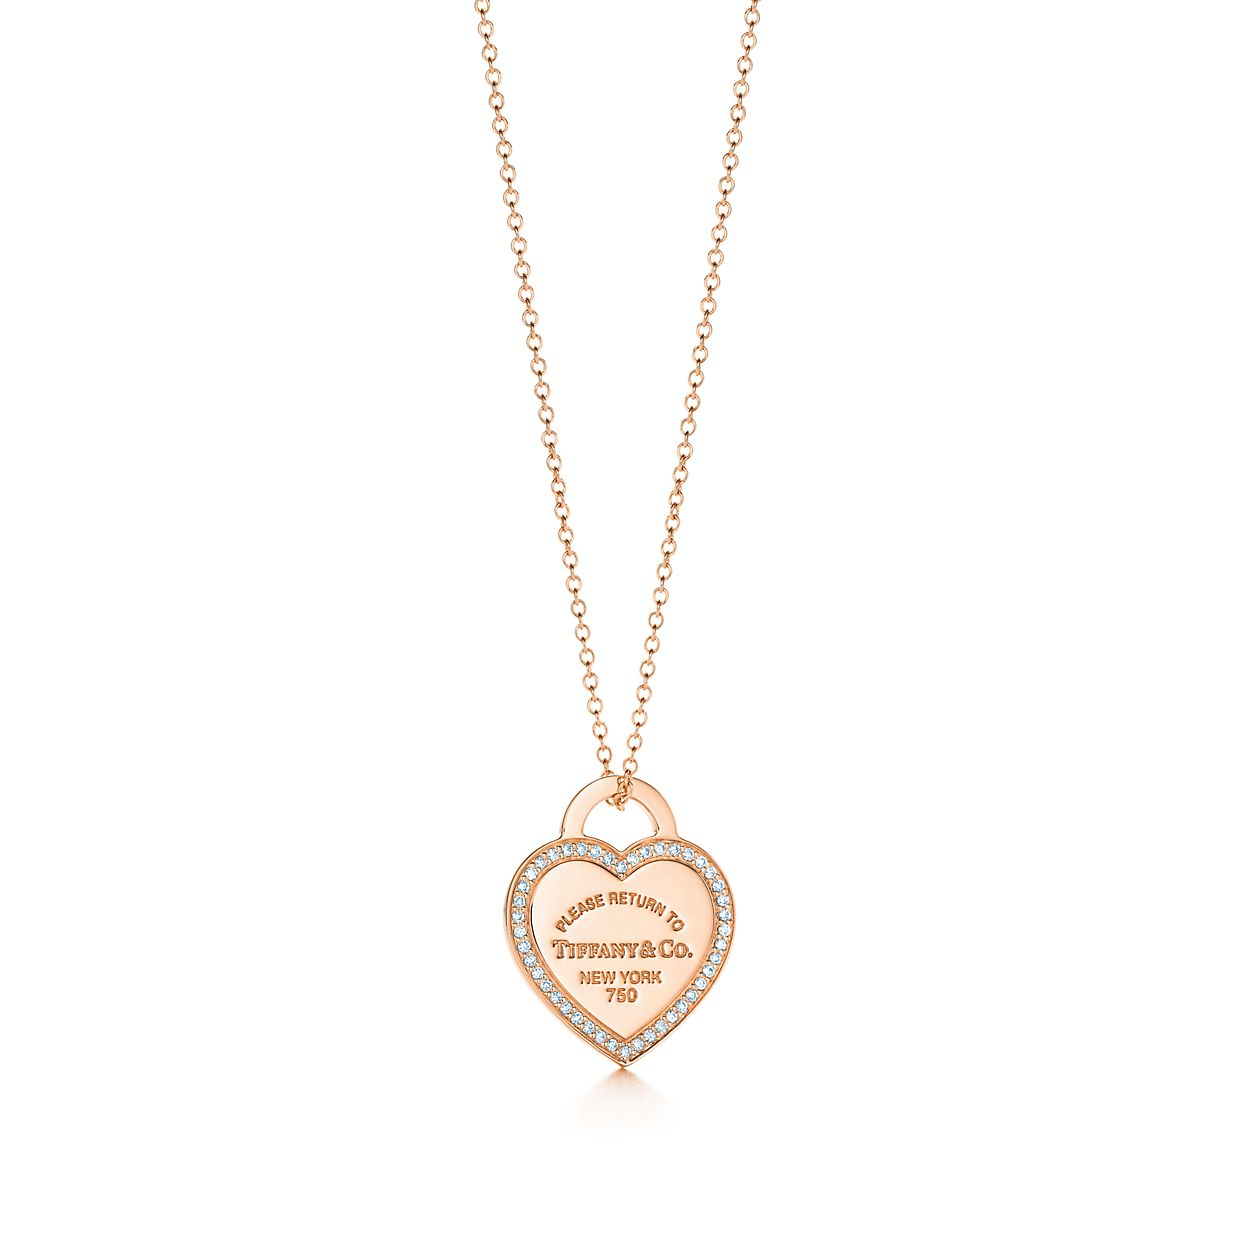 Return to tiffany small heart tag pendant in 18k rose gold with return to tiffanyheart tag pendant aloadofball Choice Image